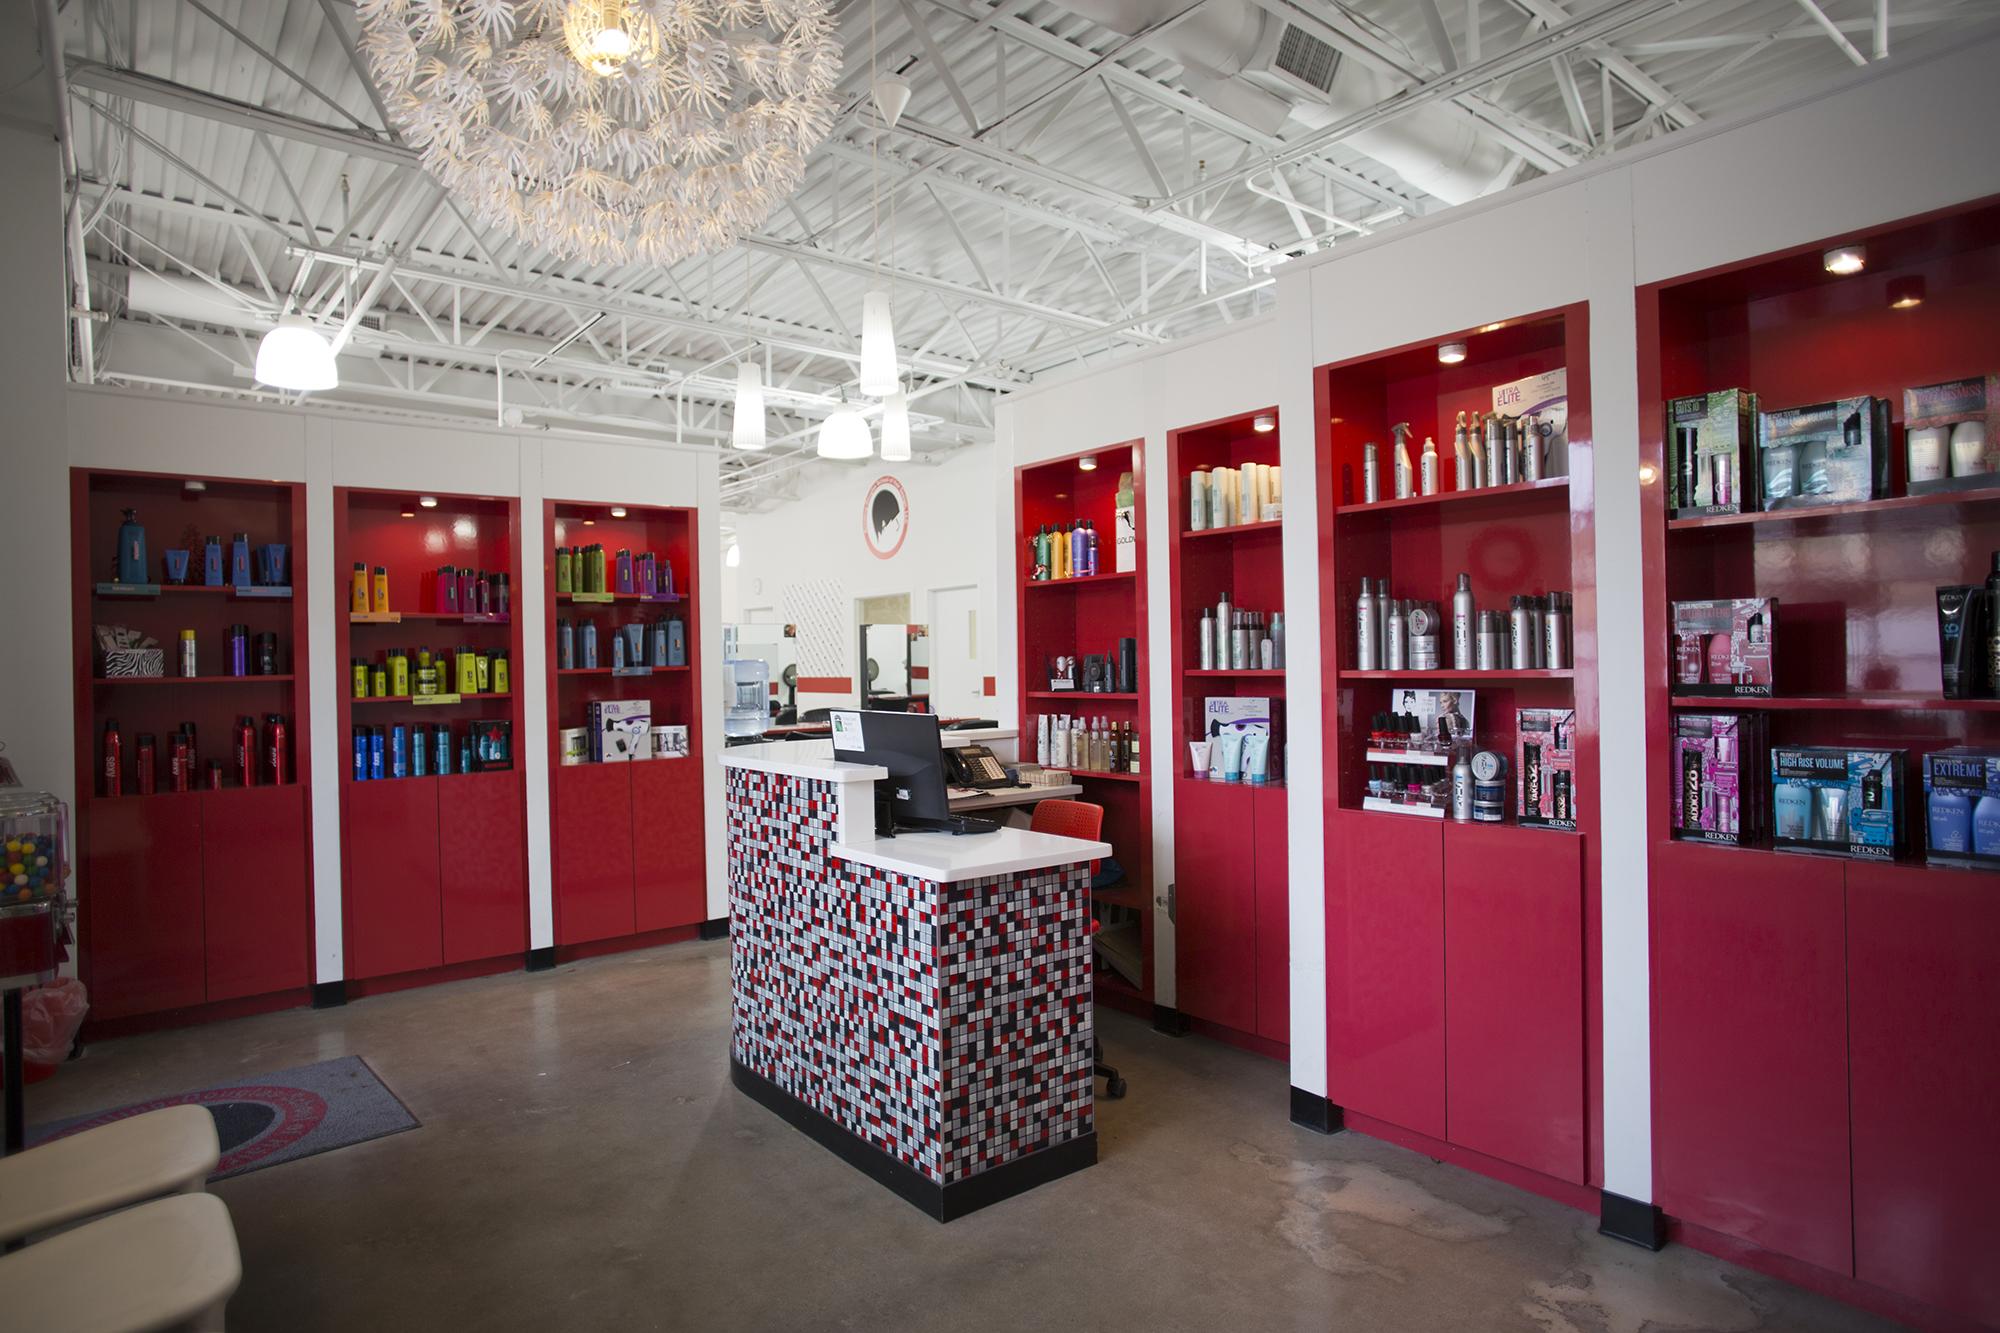 Schilling-Douglas School of Hair Design in Newark, Delaware